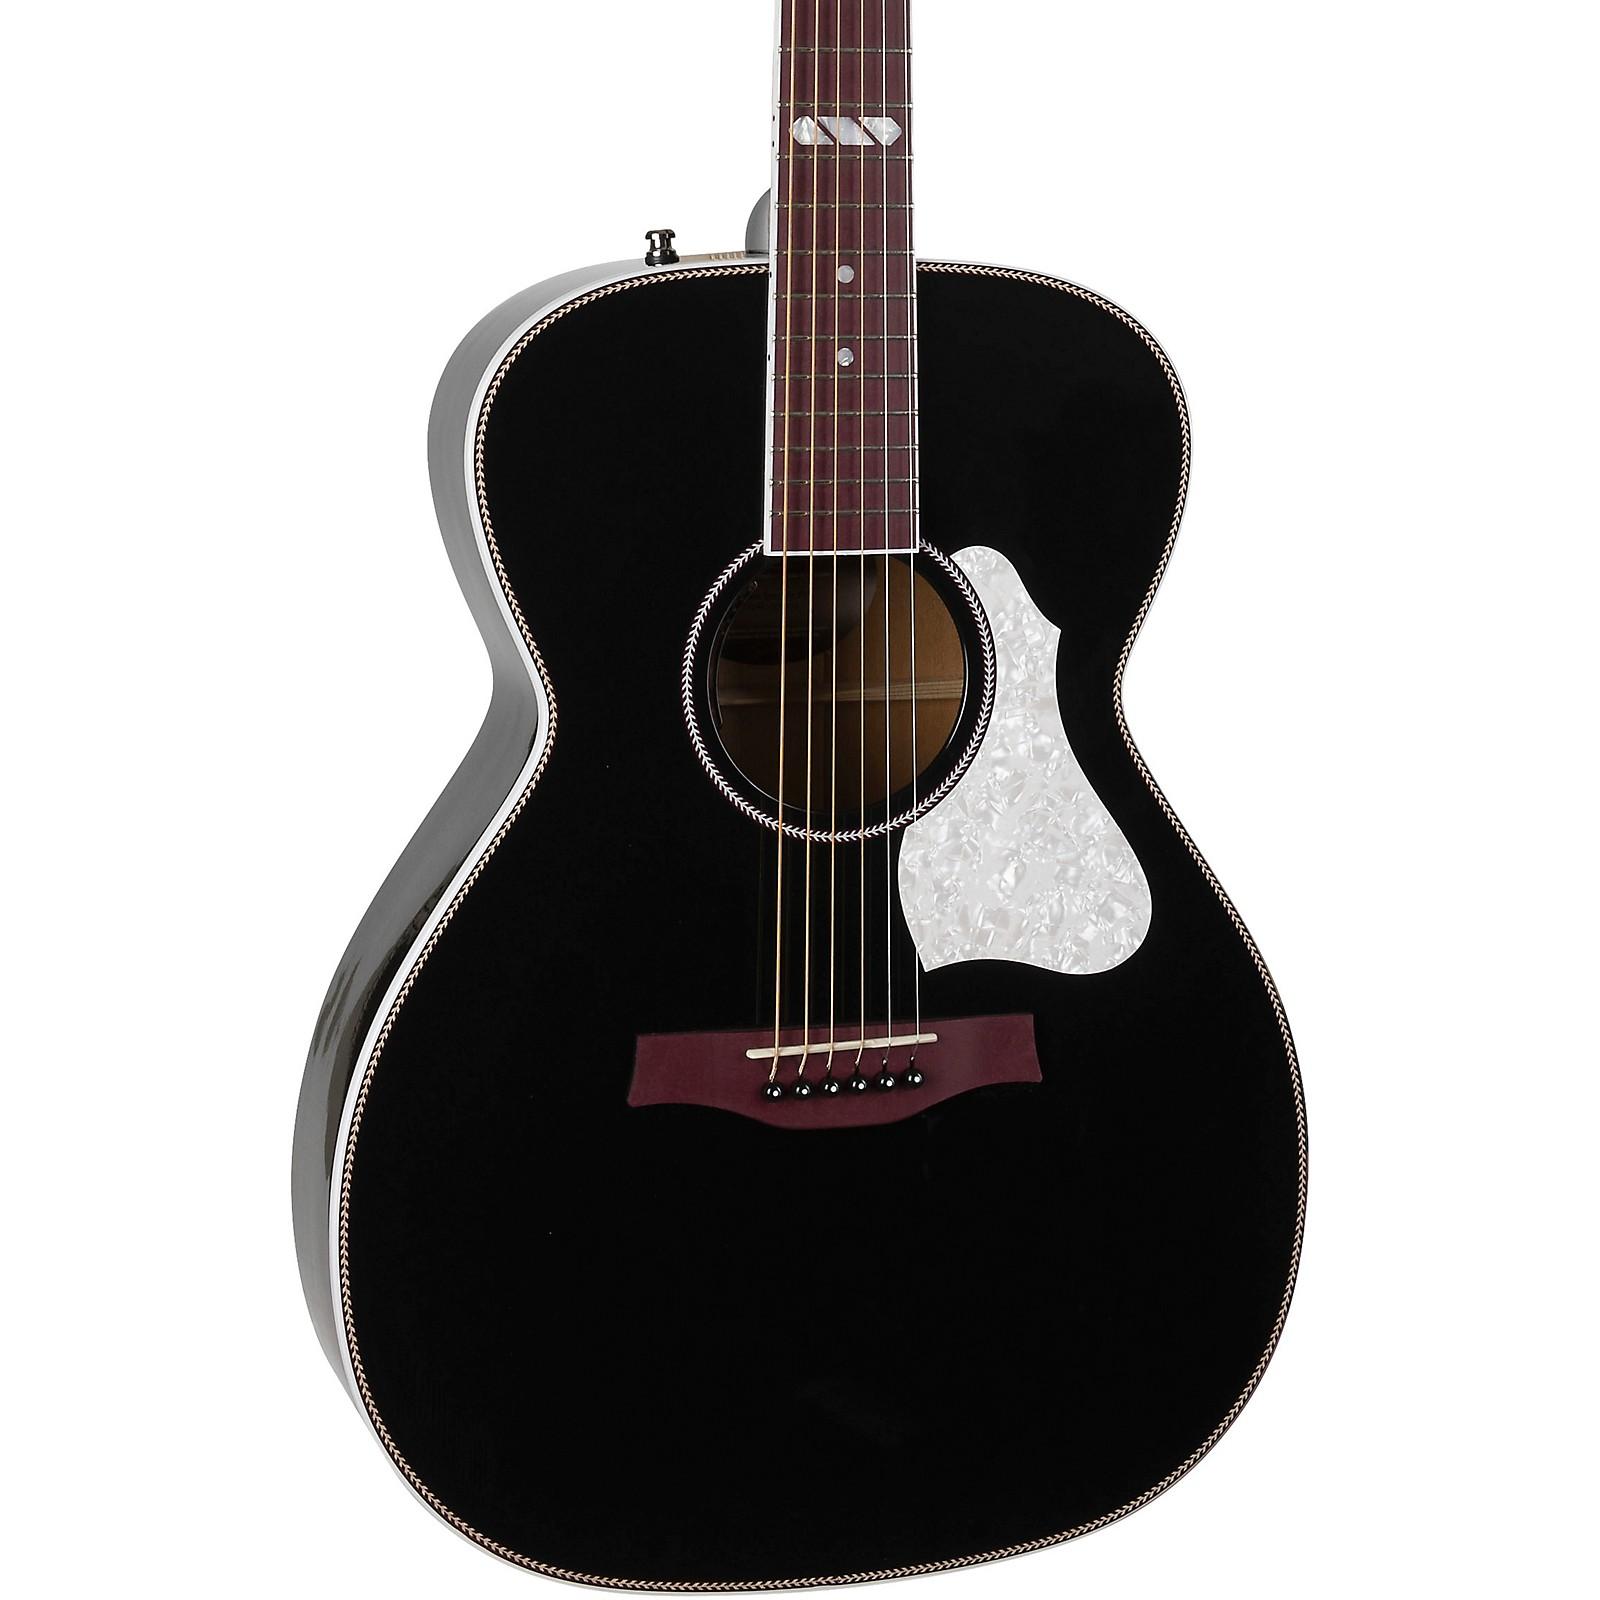 Seagull Artist Limited Tuxedo Black EQ Acoustic-Electric Guitar